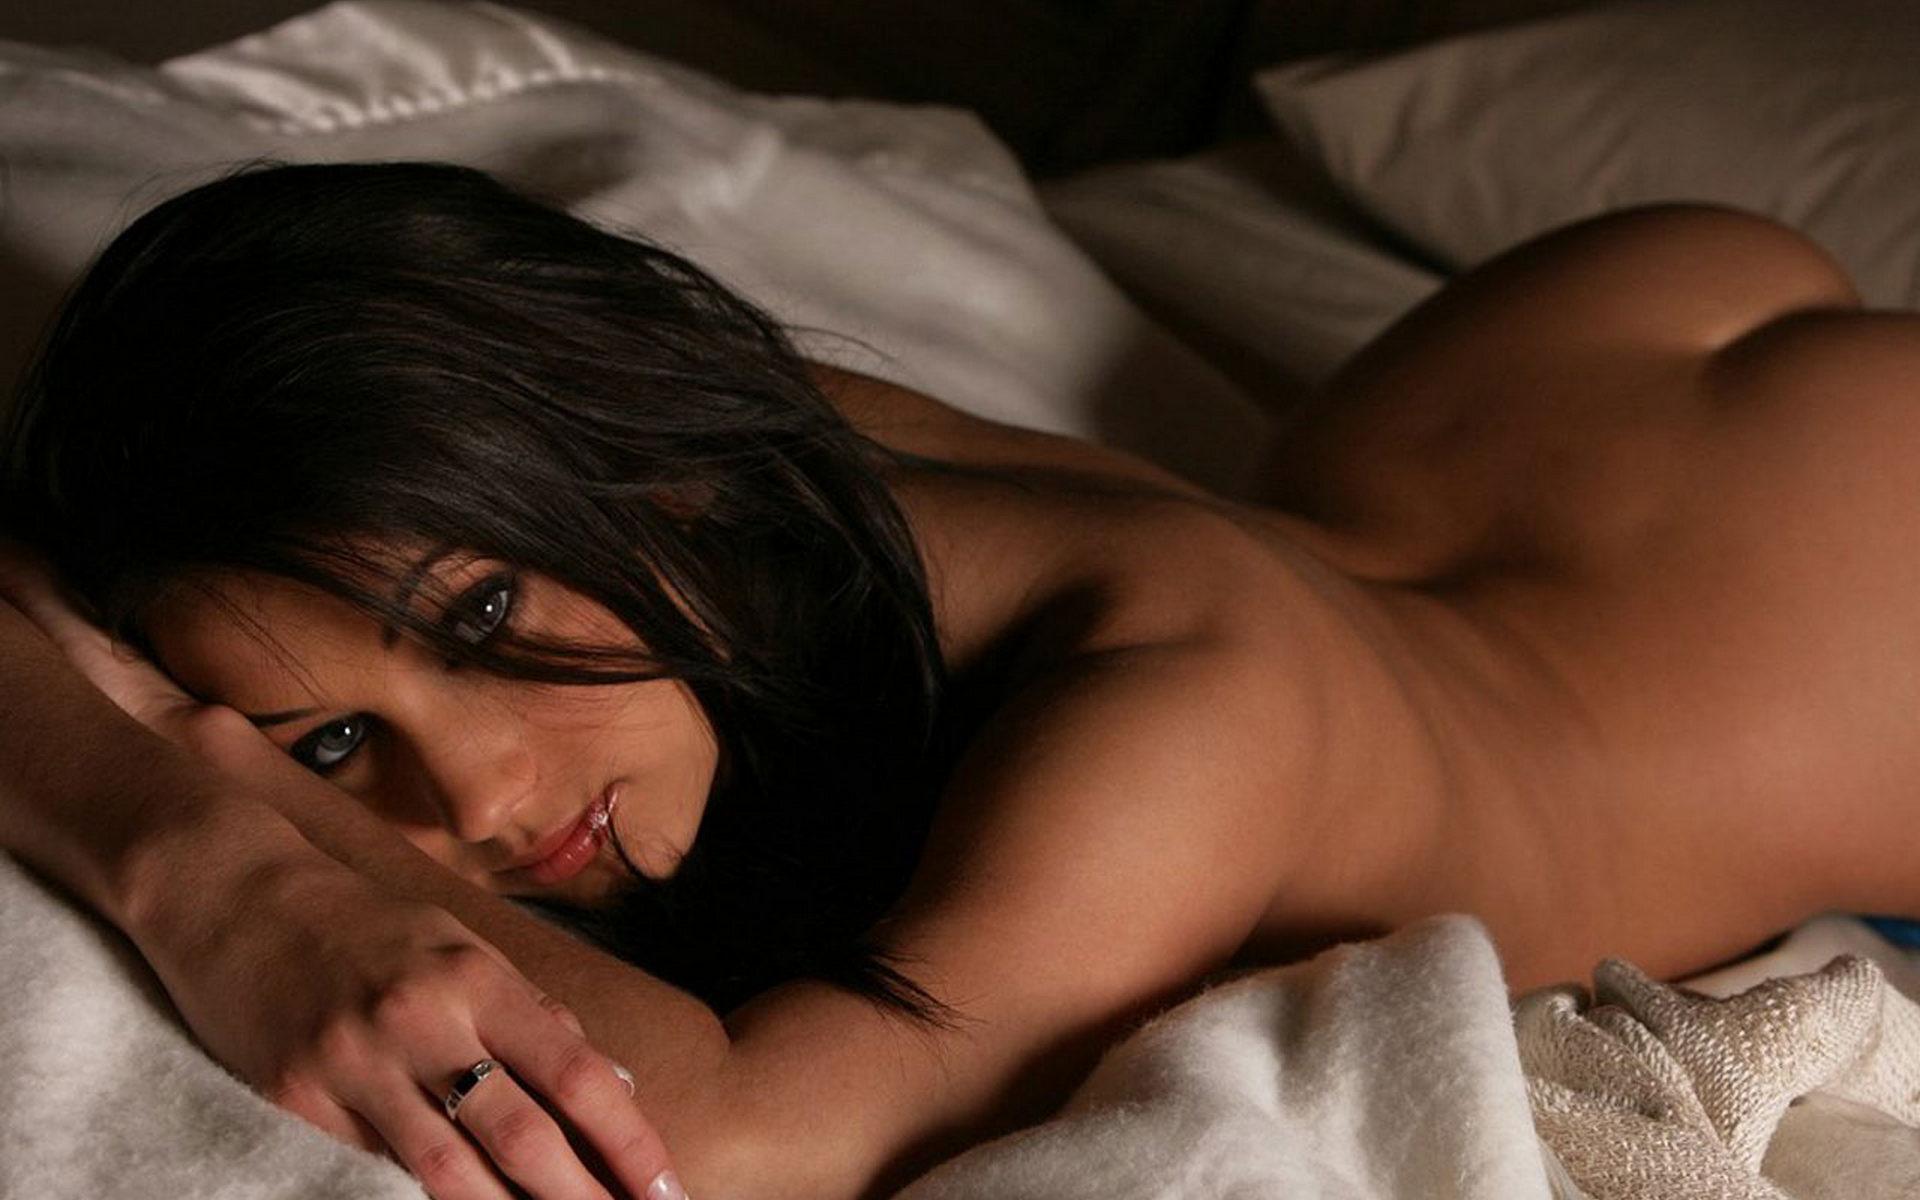 Секс в кровати девушки фото 7 фотография